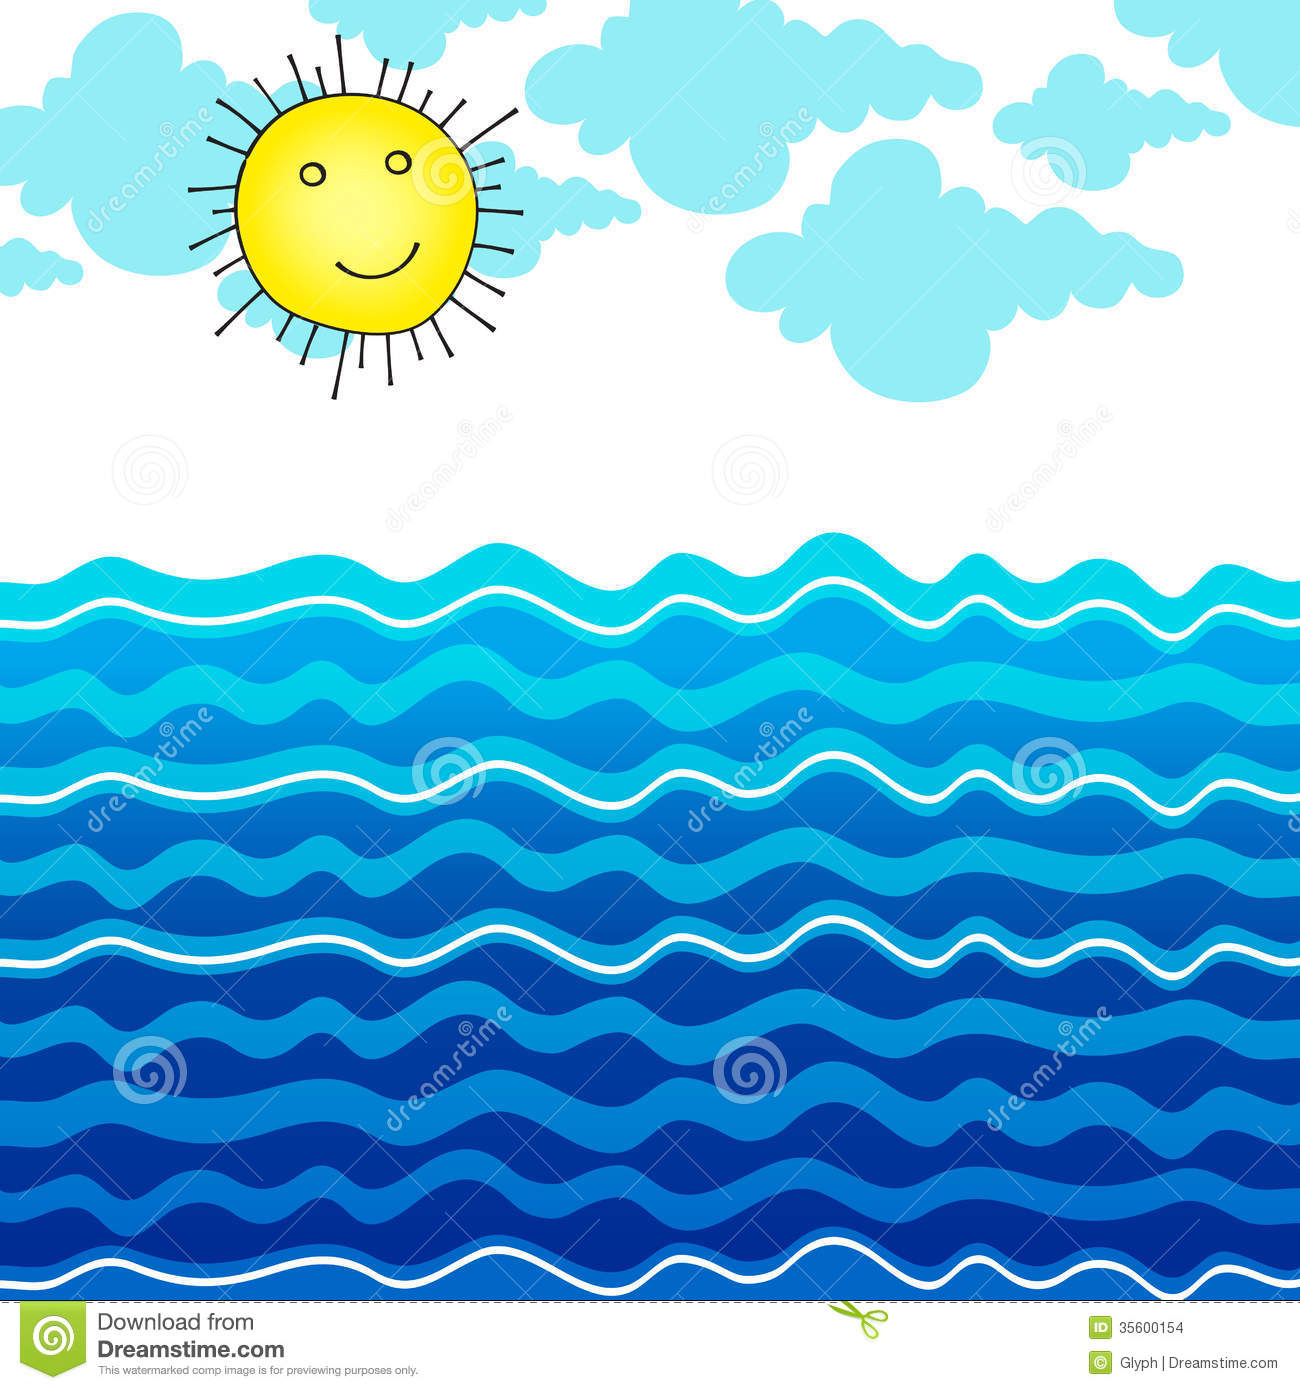 ocean clipart id-61171-ocean clipart id-61171-2